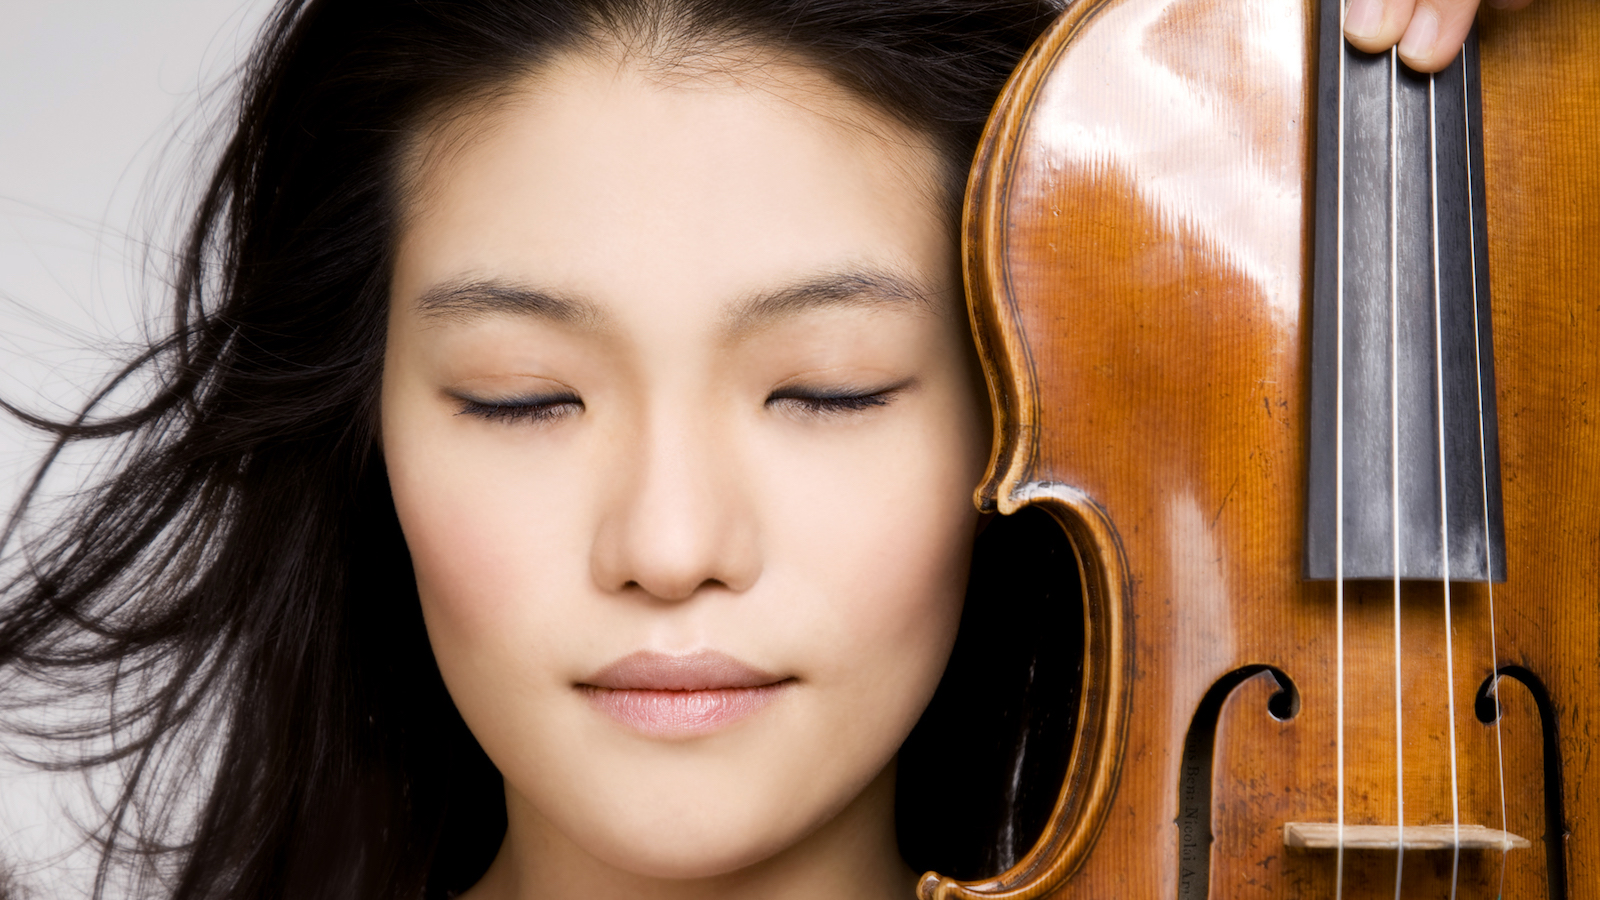 Violinistin Ye-Eun Choi